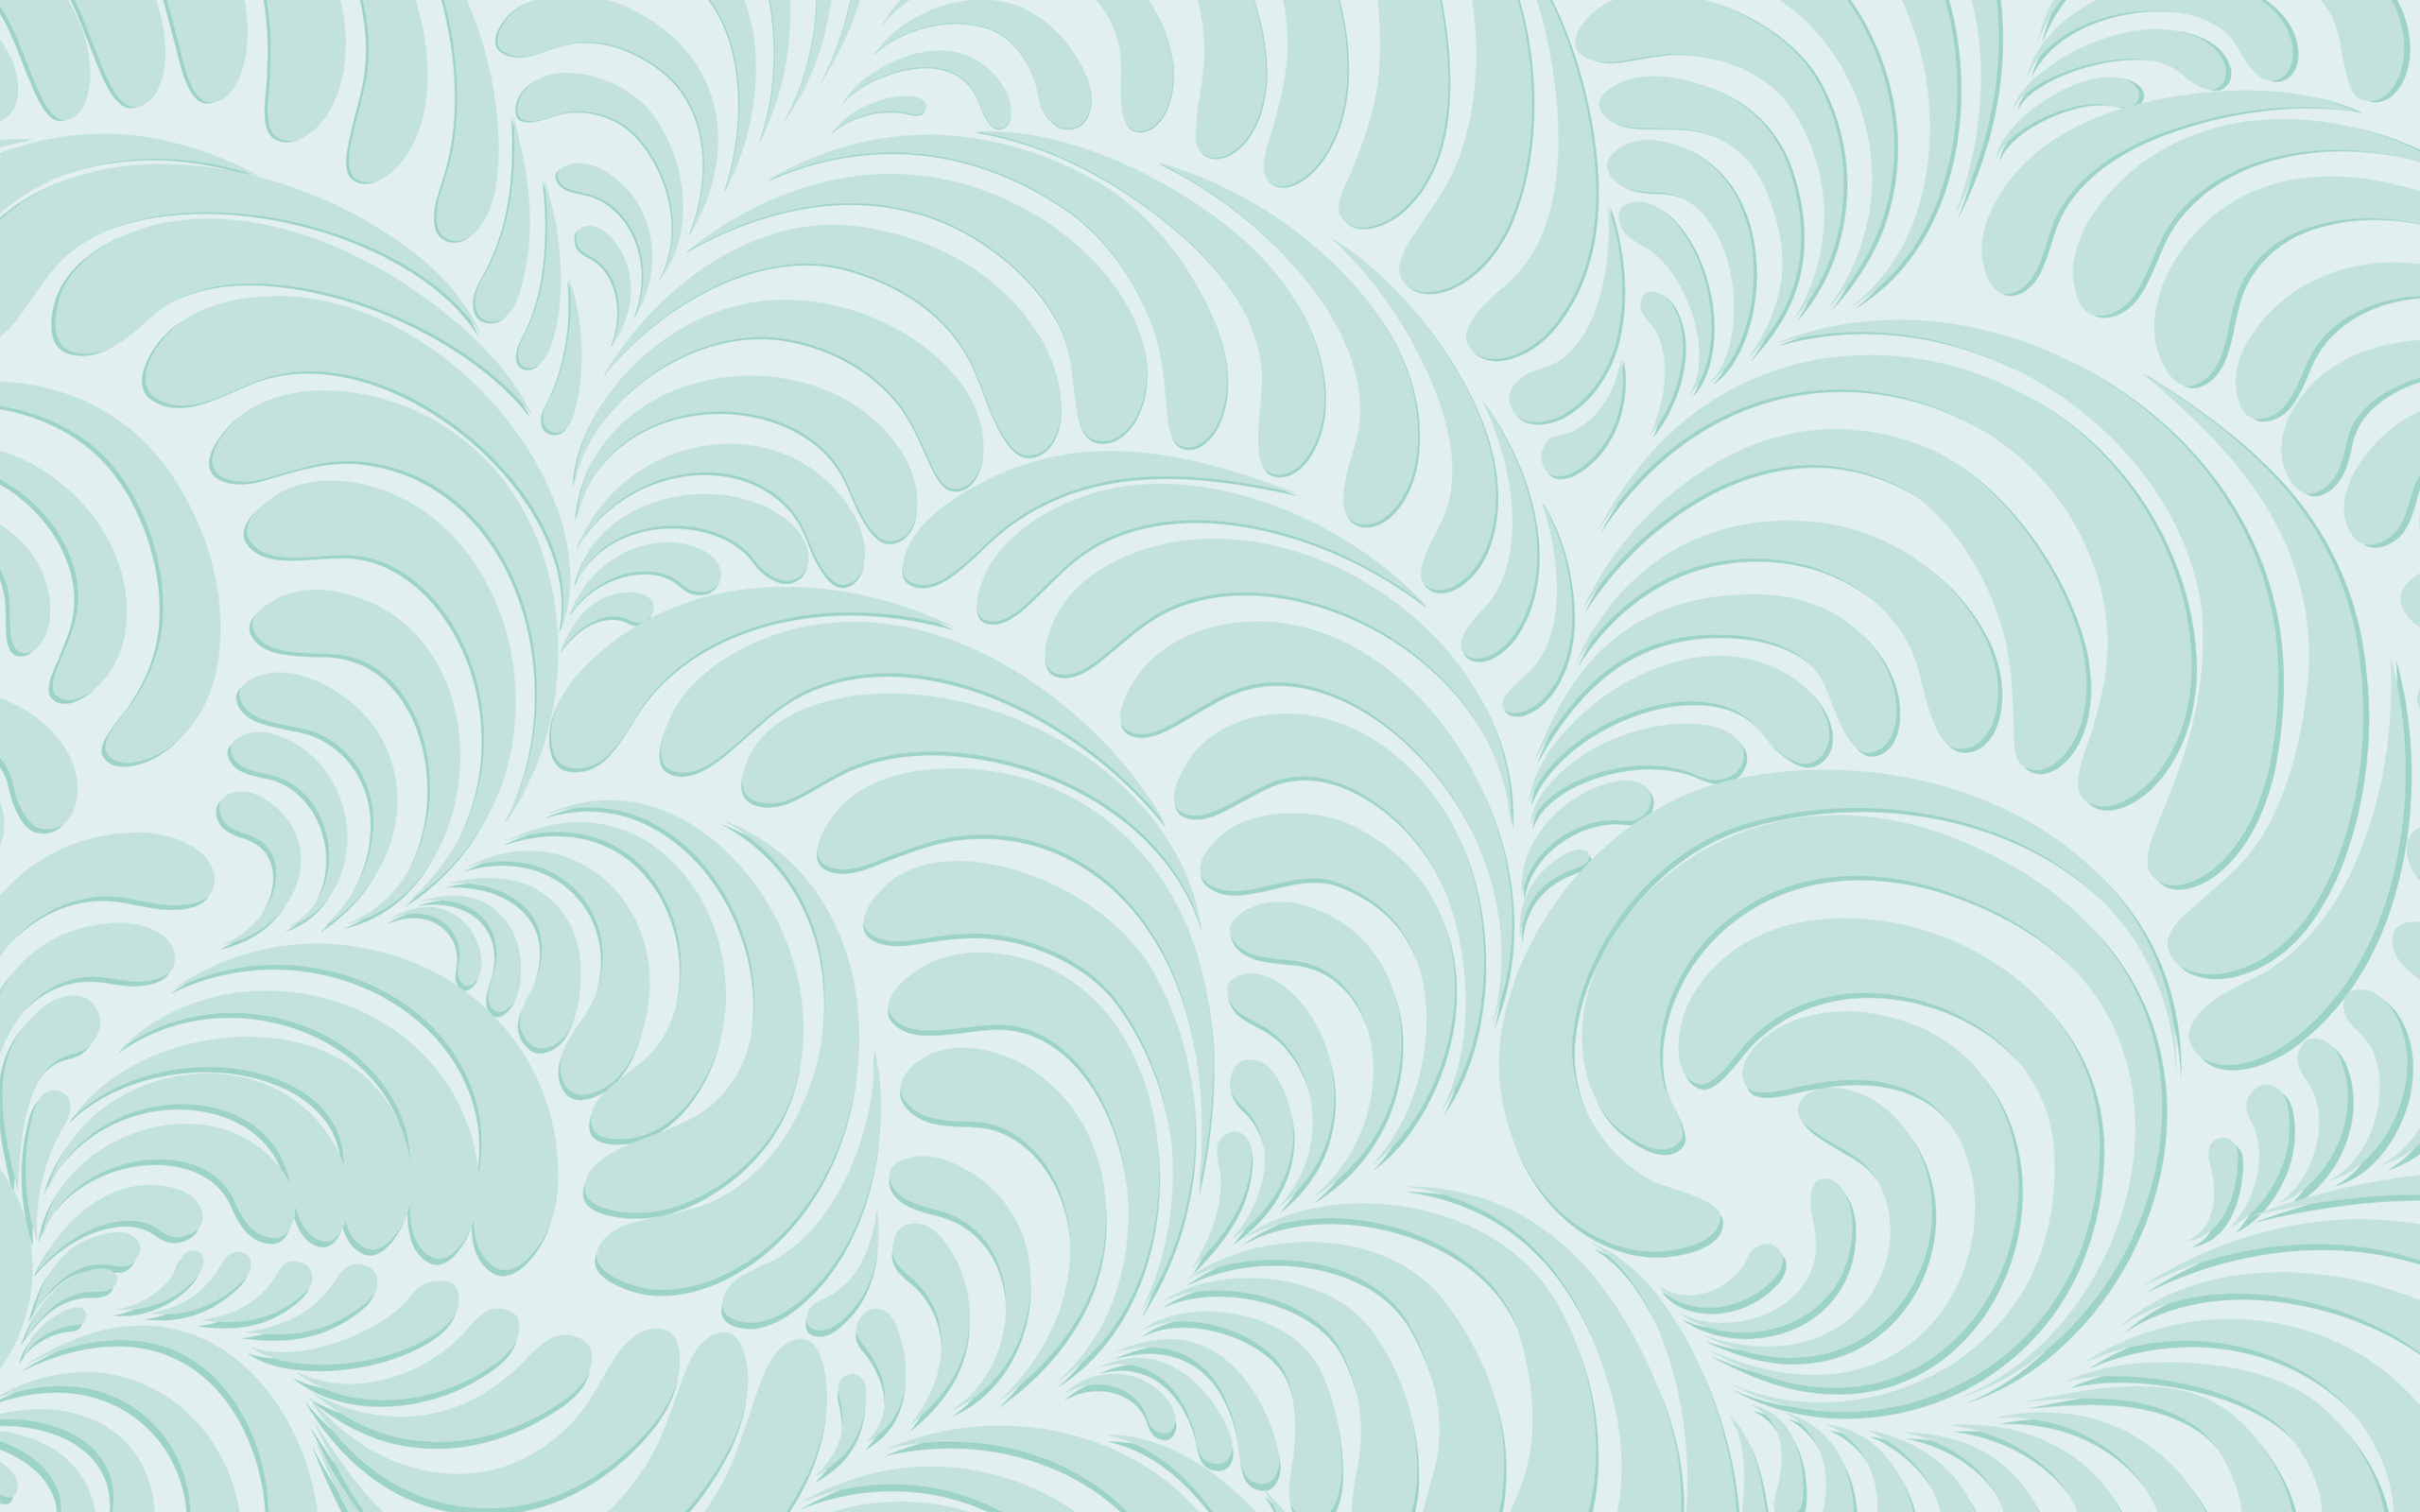 wall pattern wallpaper 1280x800 - photo #2